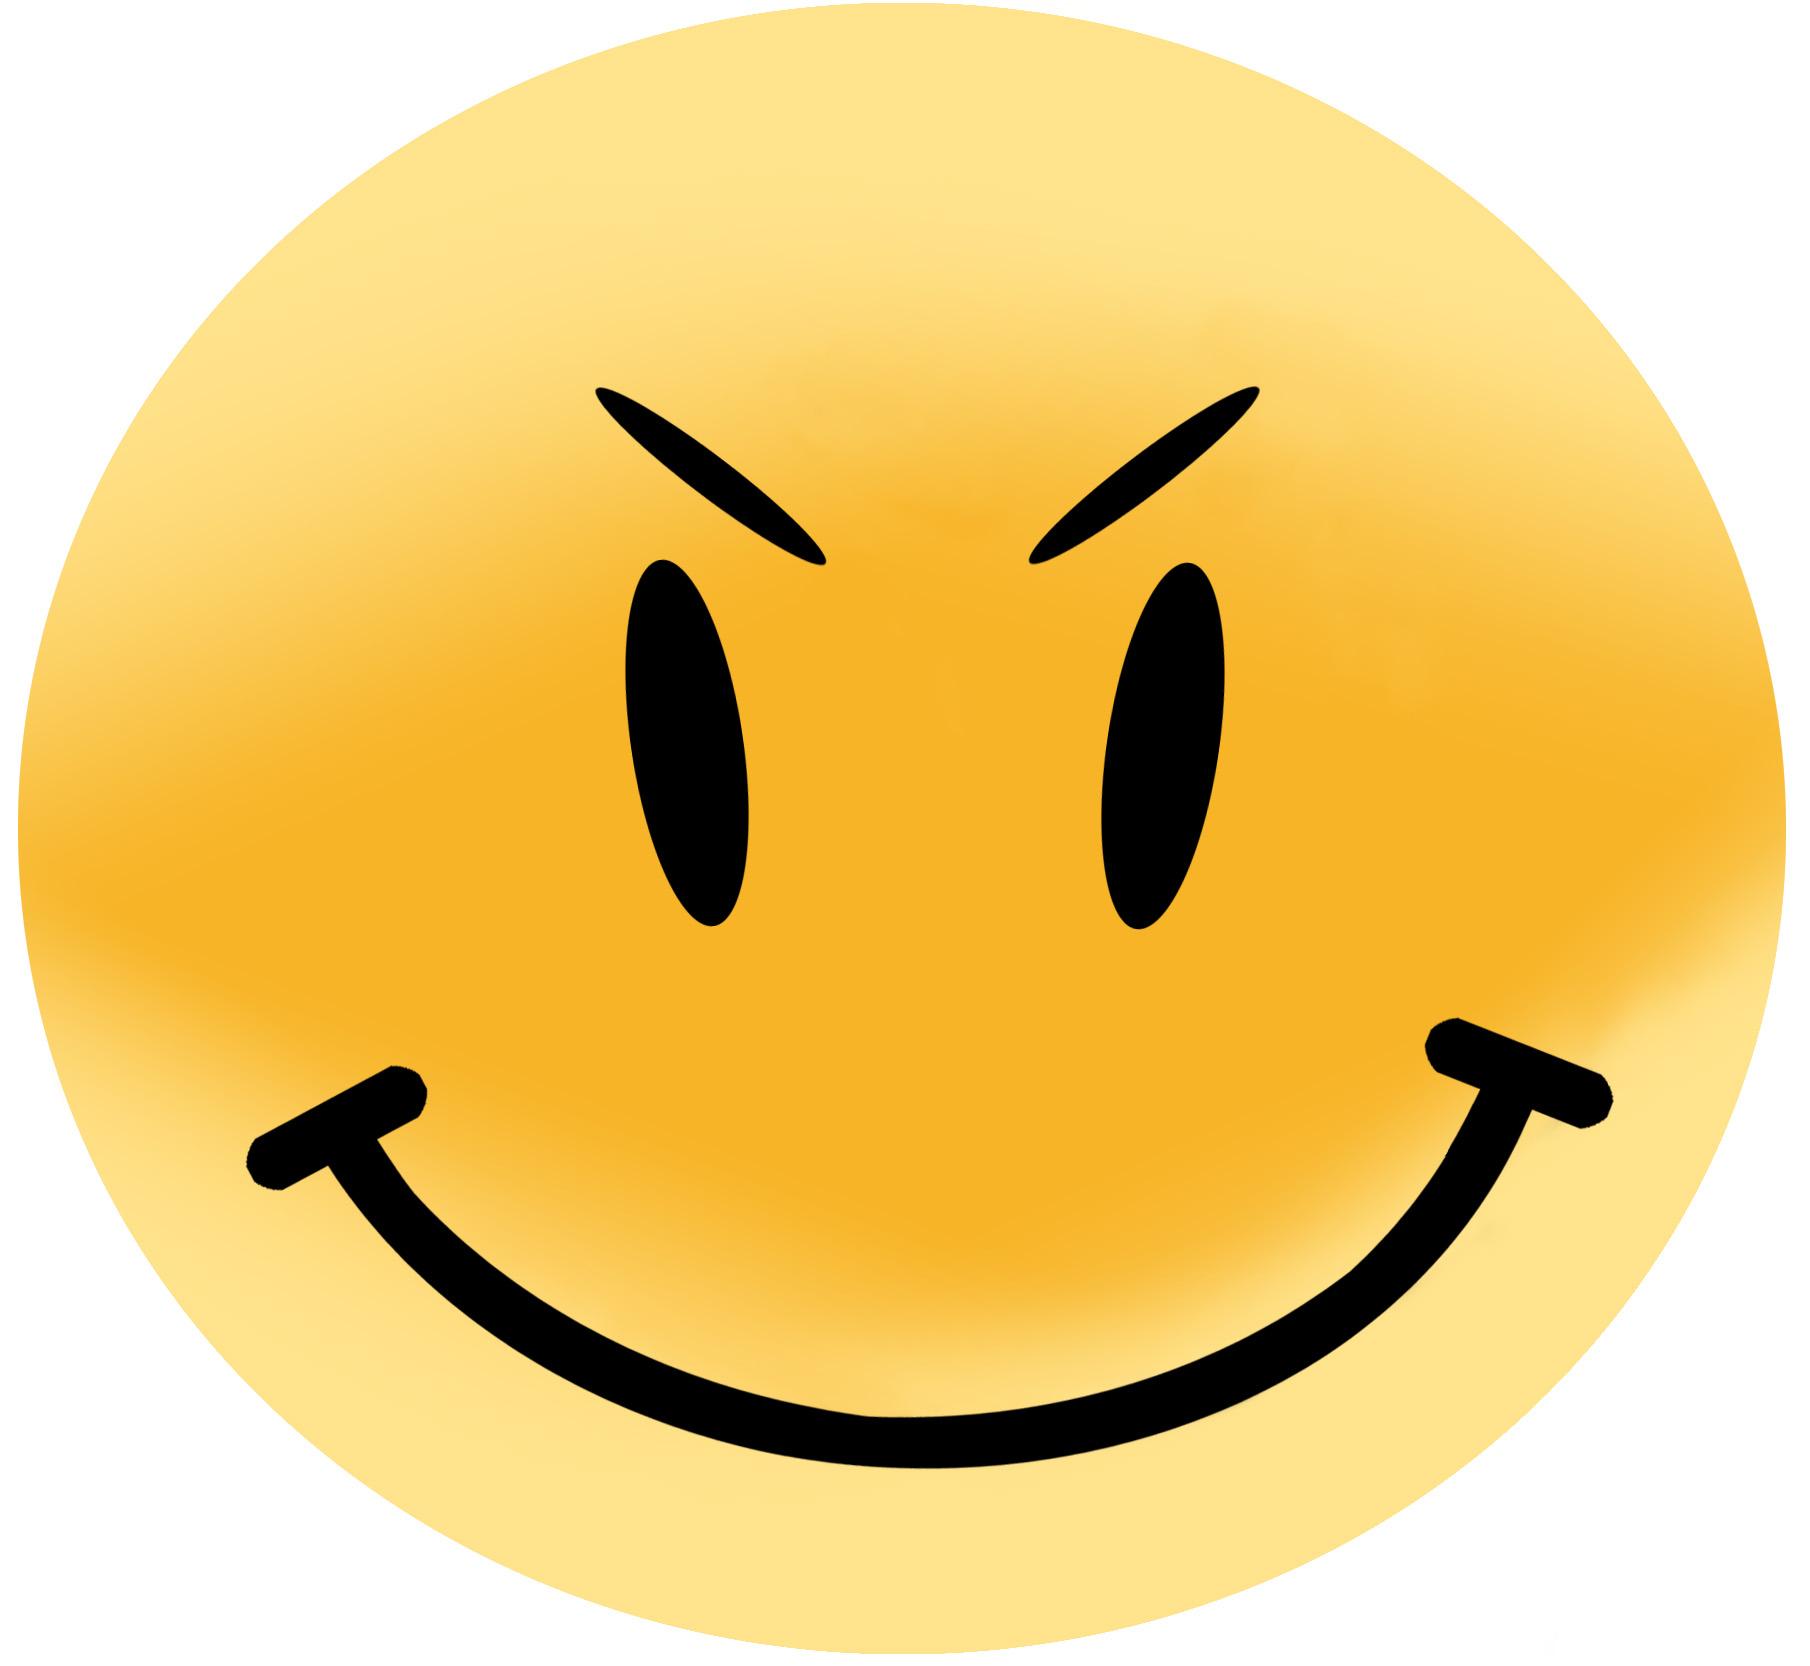 Evil smiley face clip art Transparent pictures on F.